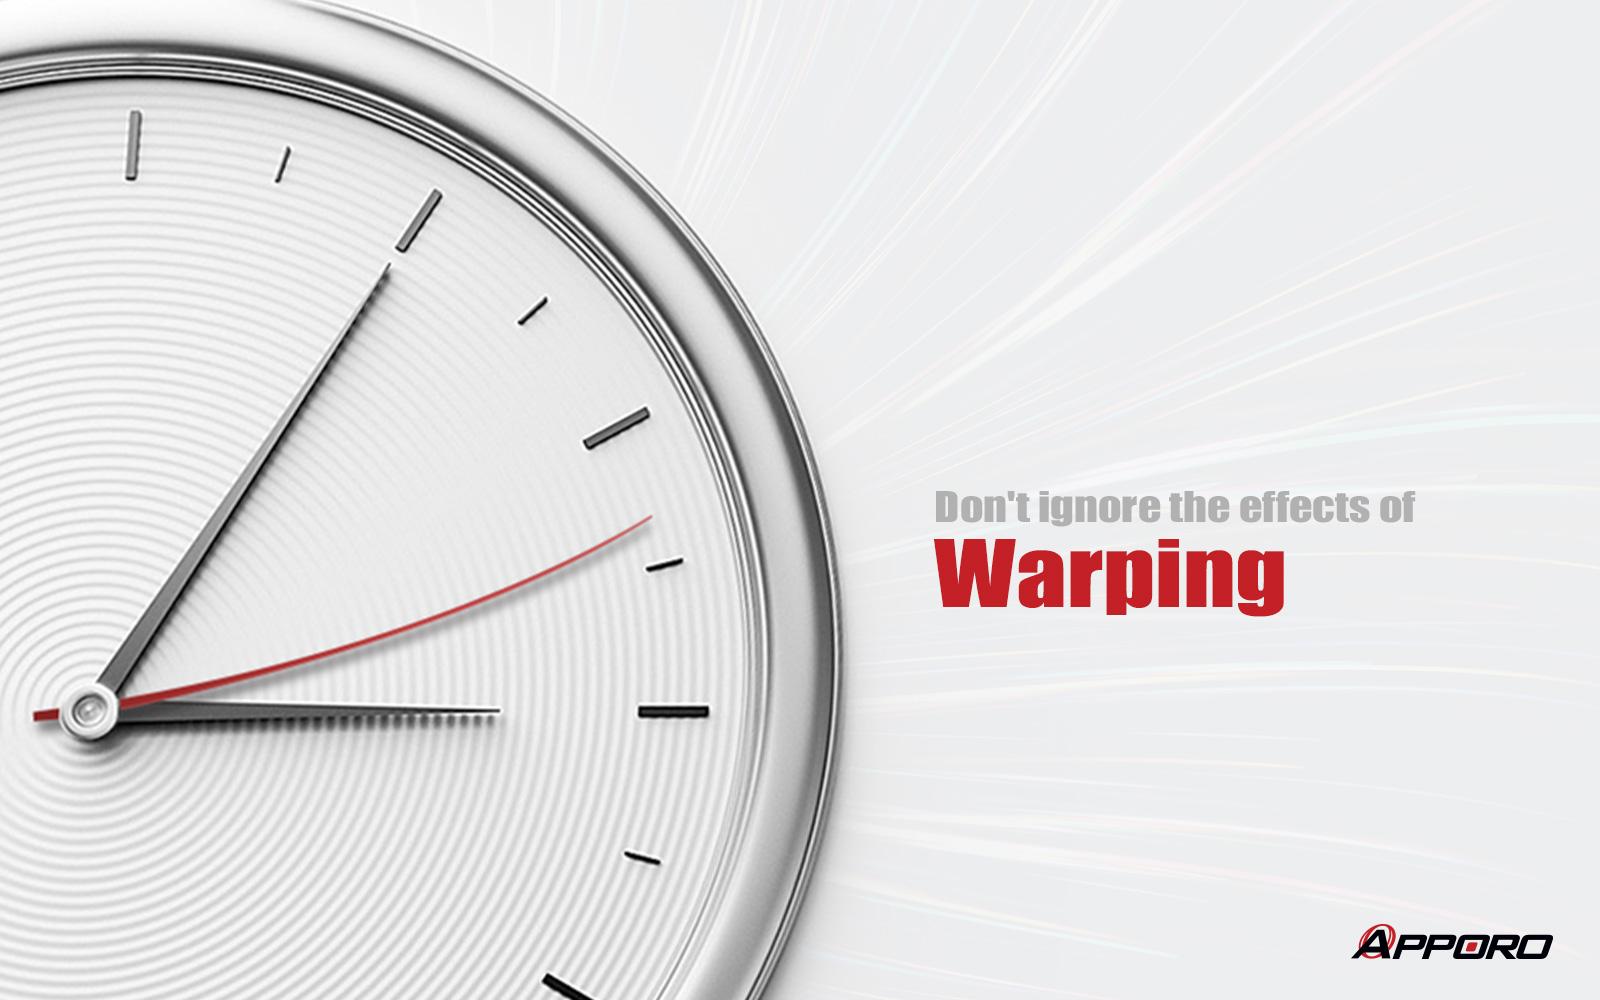 APPORO-Design Matters (Part 3) - Warping